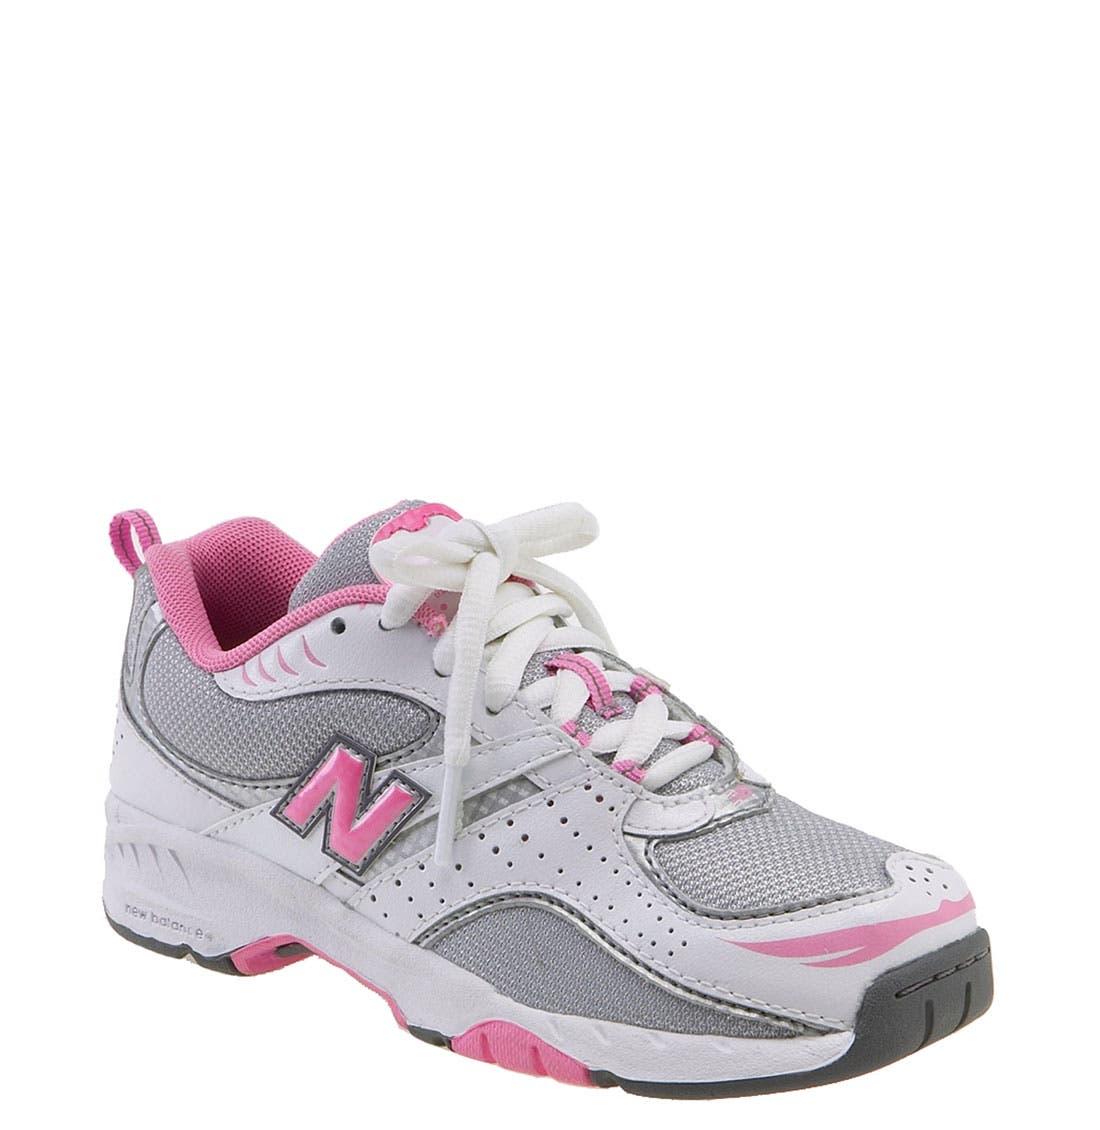 Alternate Image 1 Selected - New Balance '515' Running Shoe (Toddler, Little Kid & Big Kid)